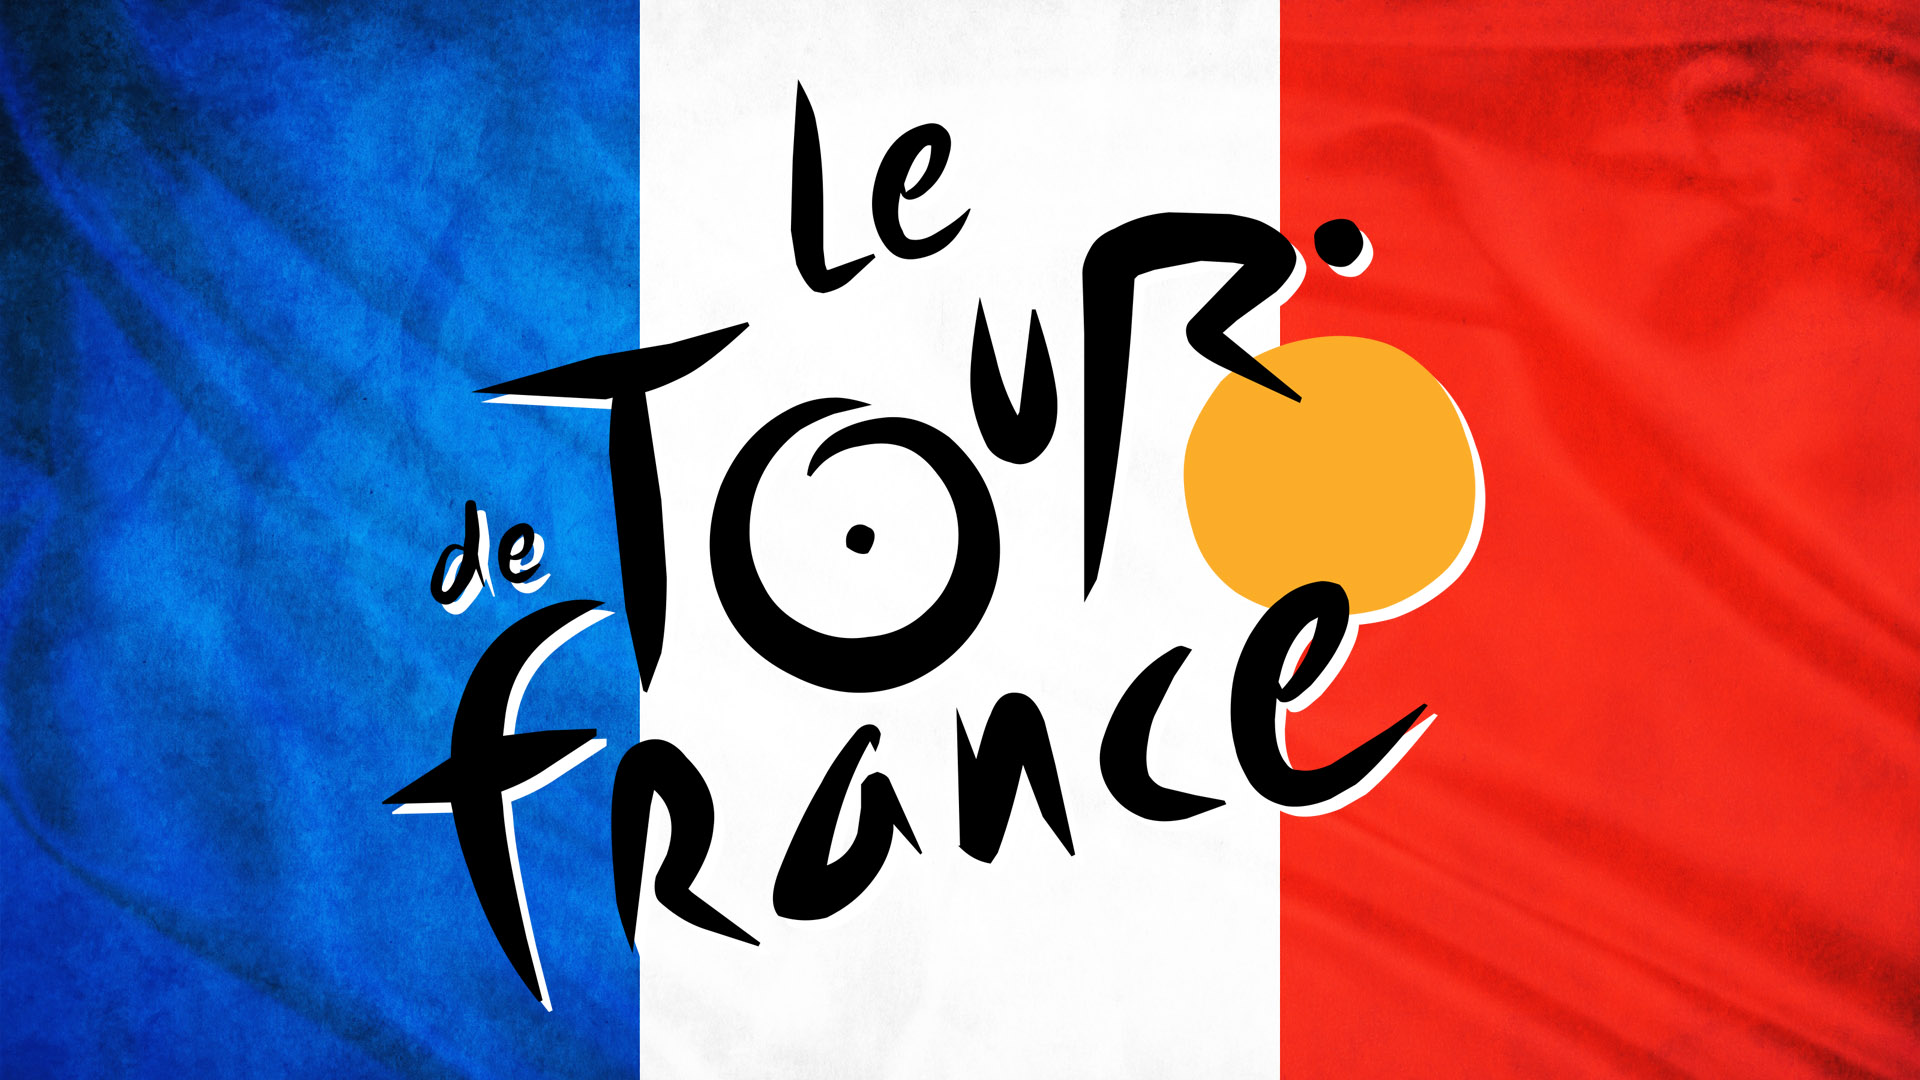 tour-de-france-logo-on-france-flag_1920x1080_746-hd